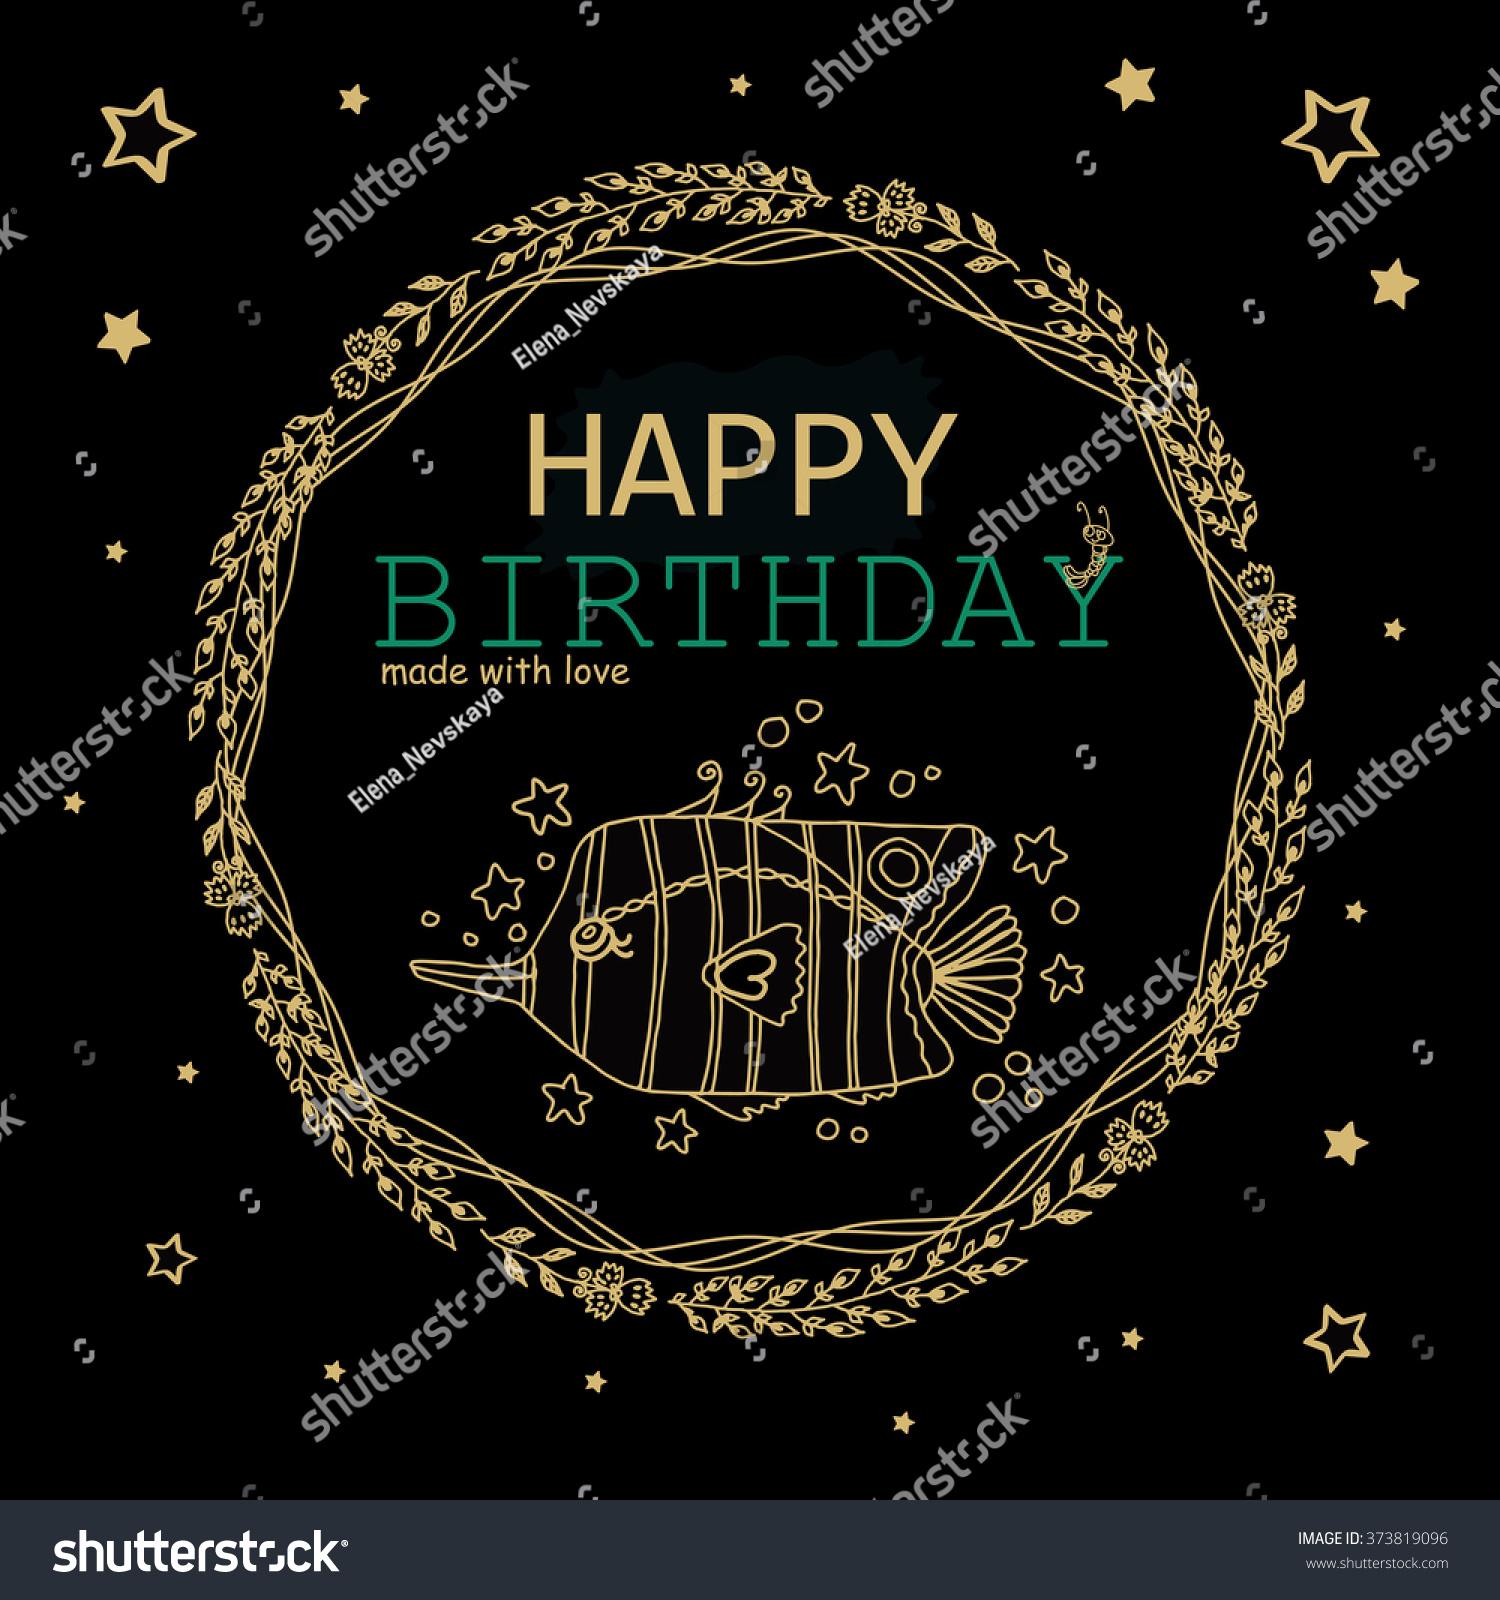 Happy Birthday Greeting Card Black Gold Stock Vector Royalty Free